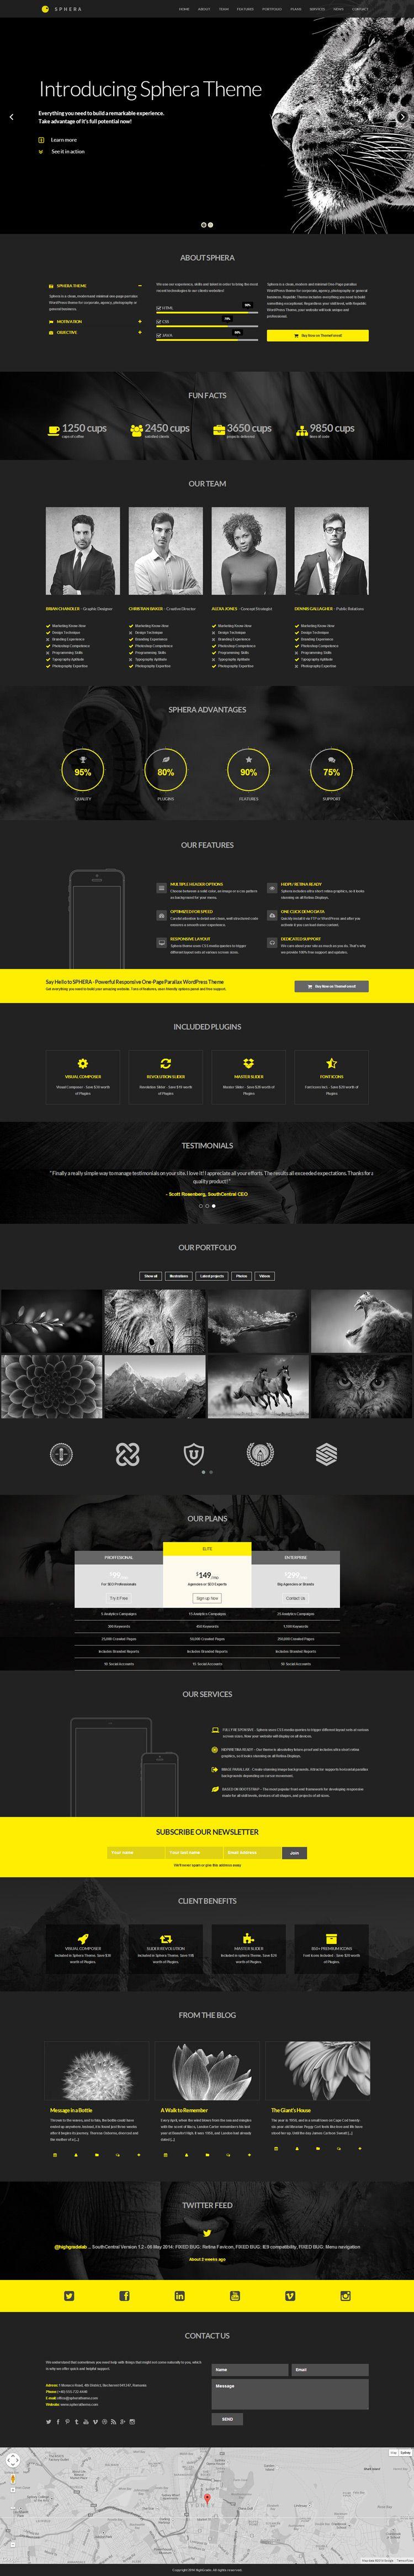 Dark WordPress Theme - Sphera http://www.wpmustache.com/wordpress/dark-wordpress-theme-sphera/